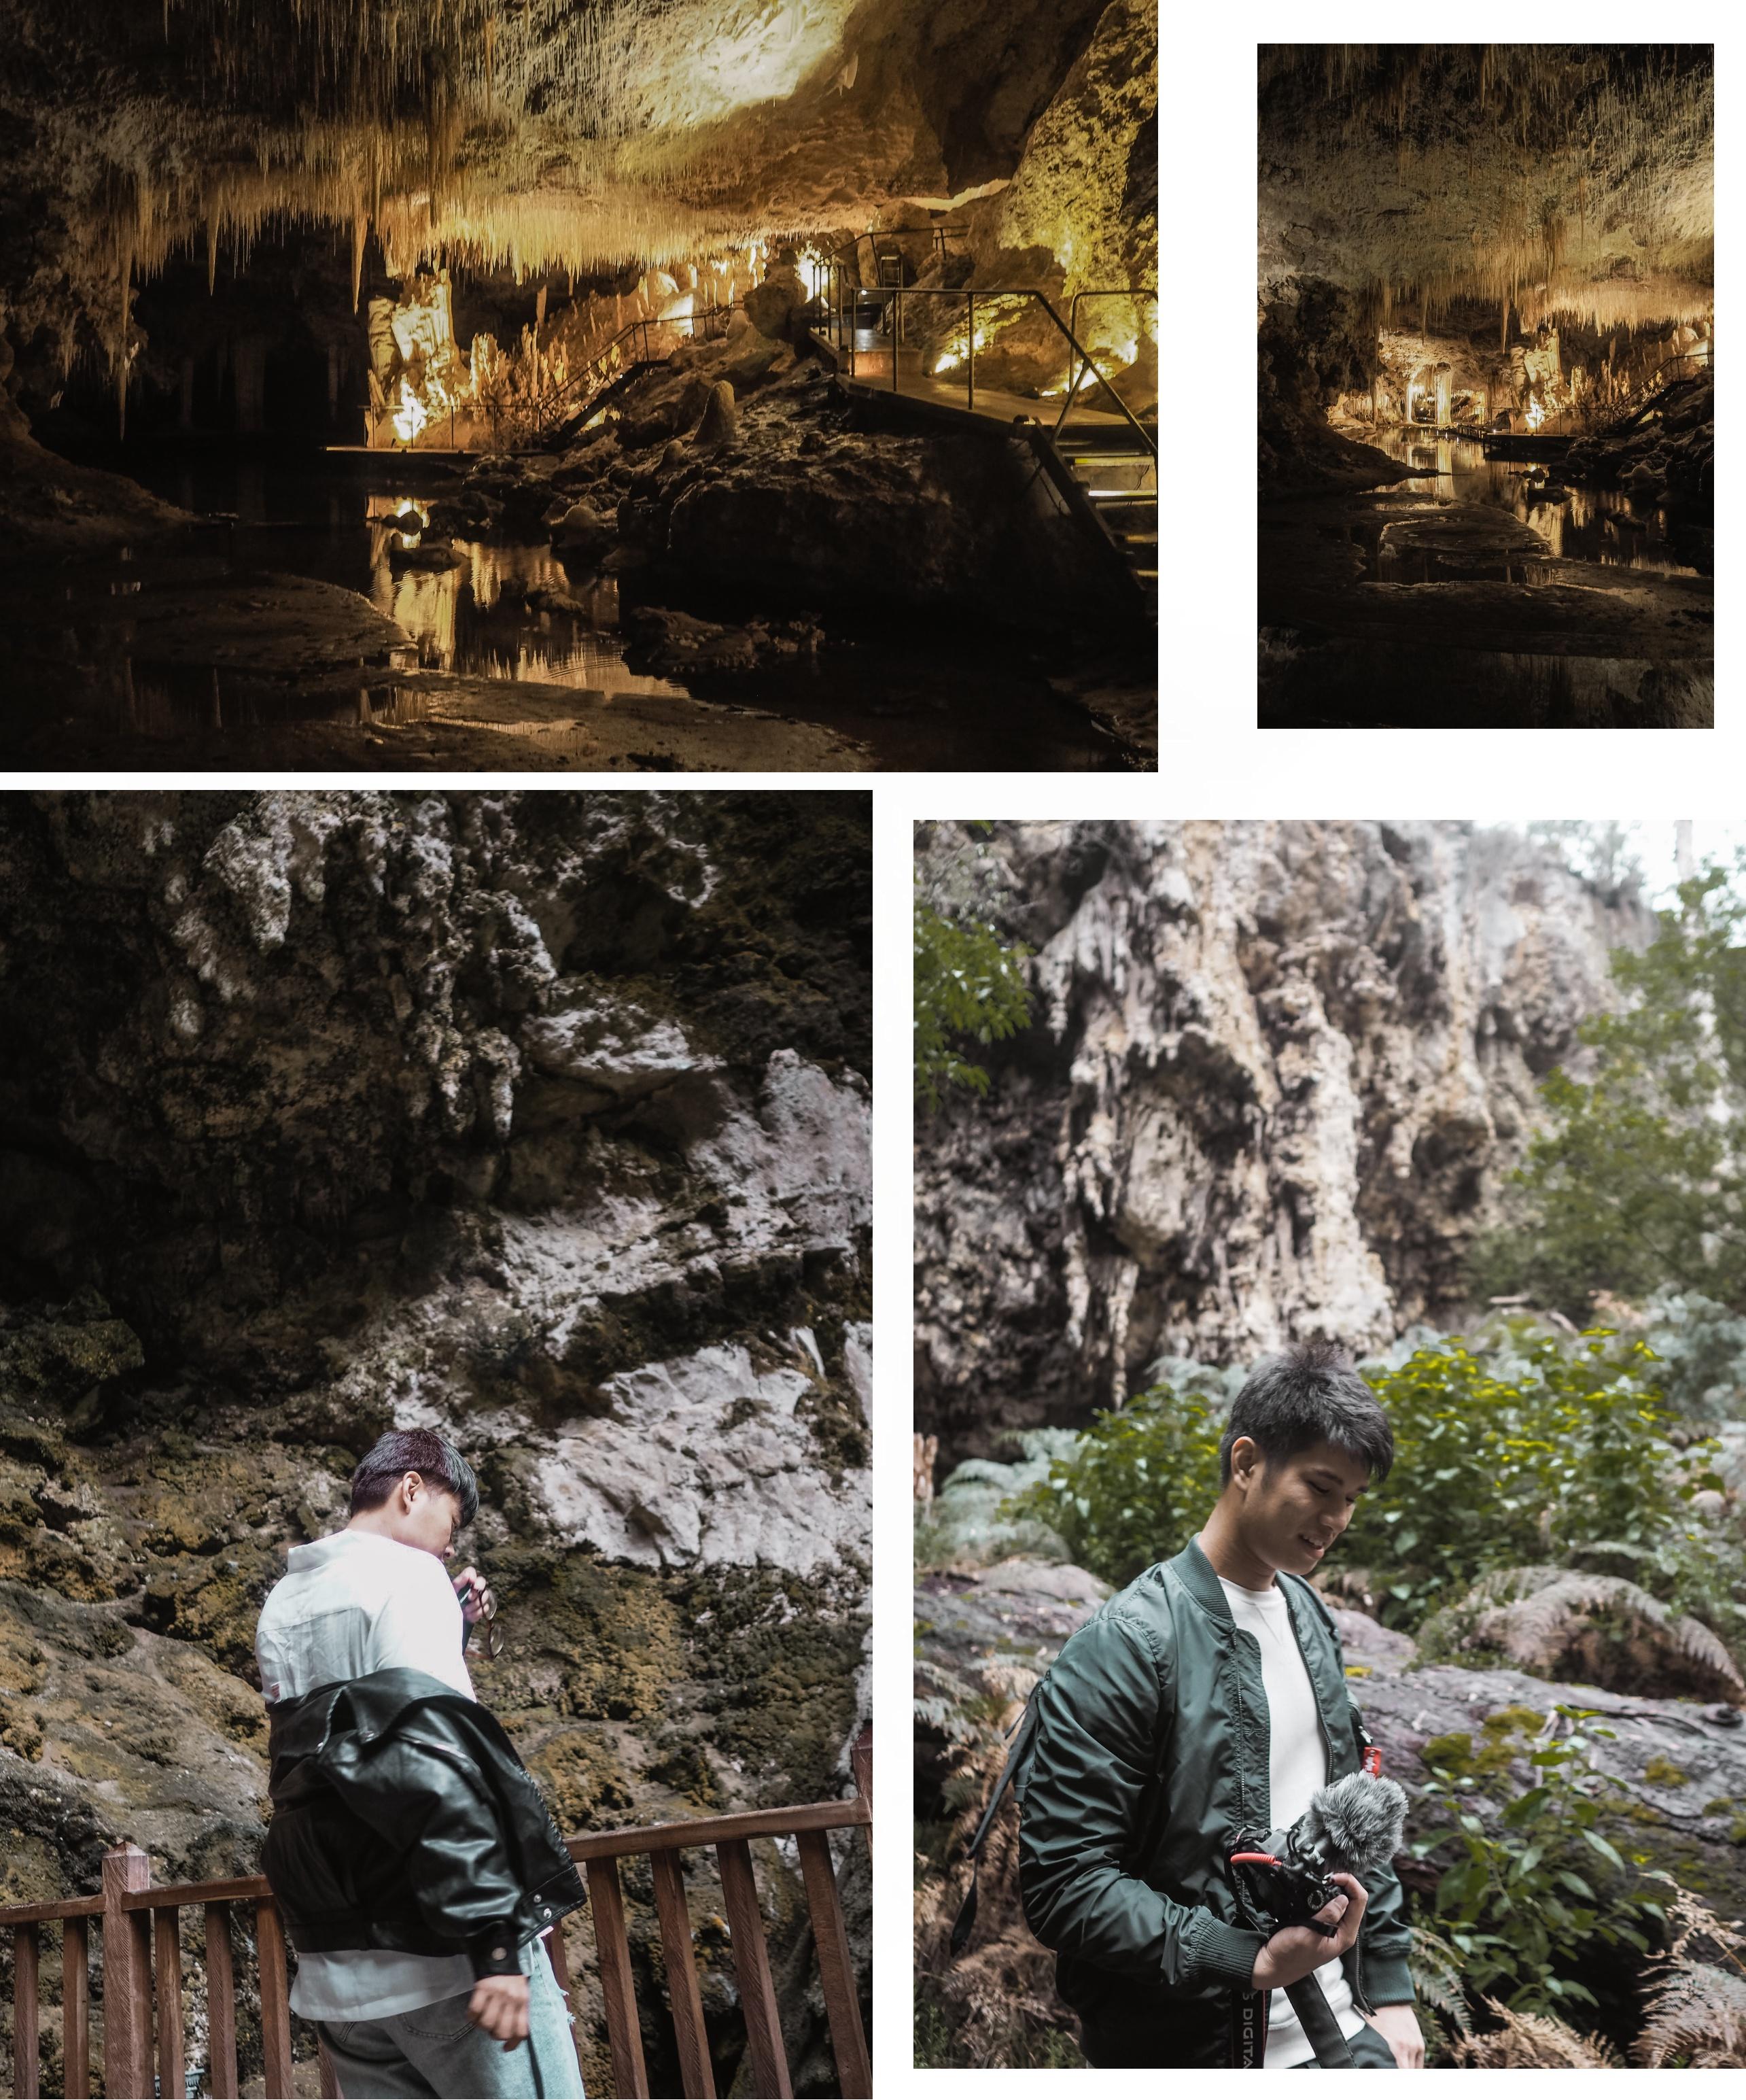 Lake Cave 2